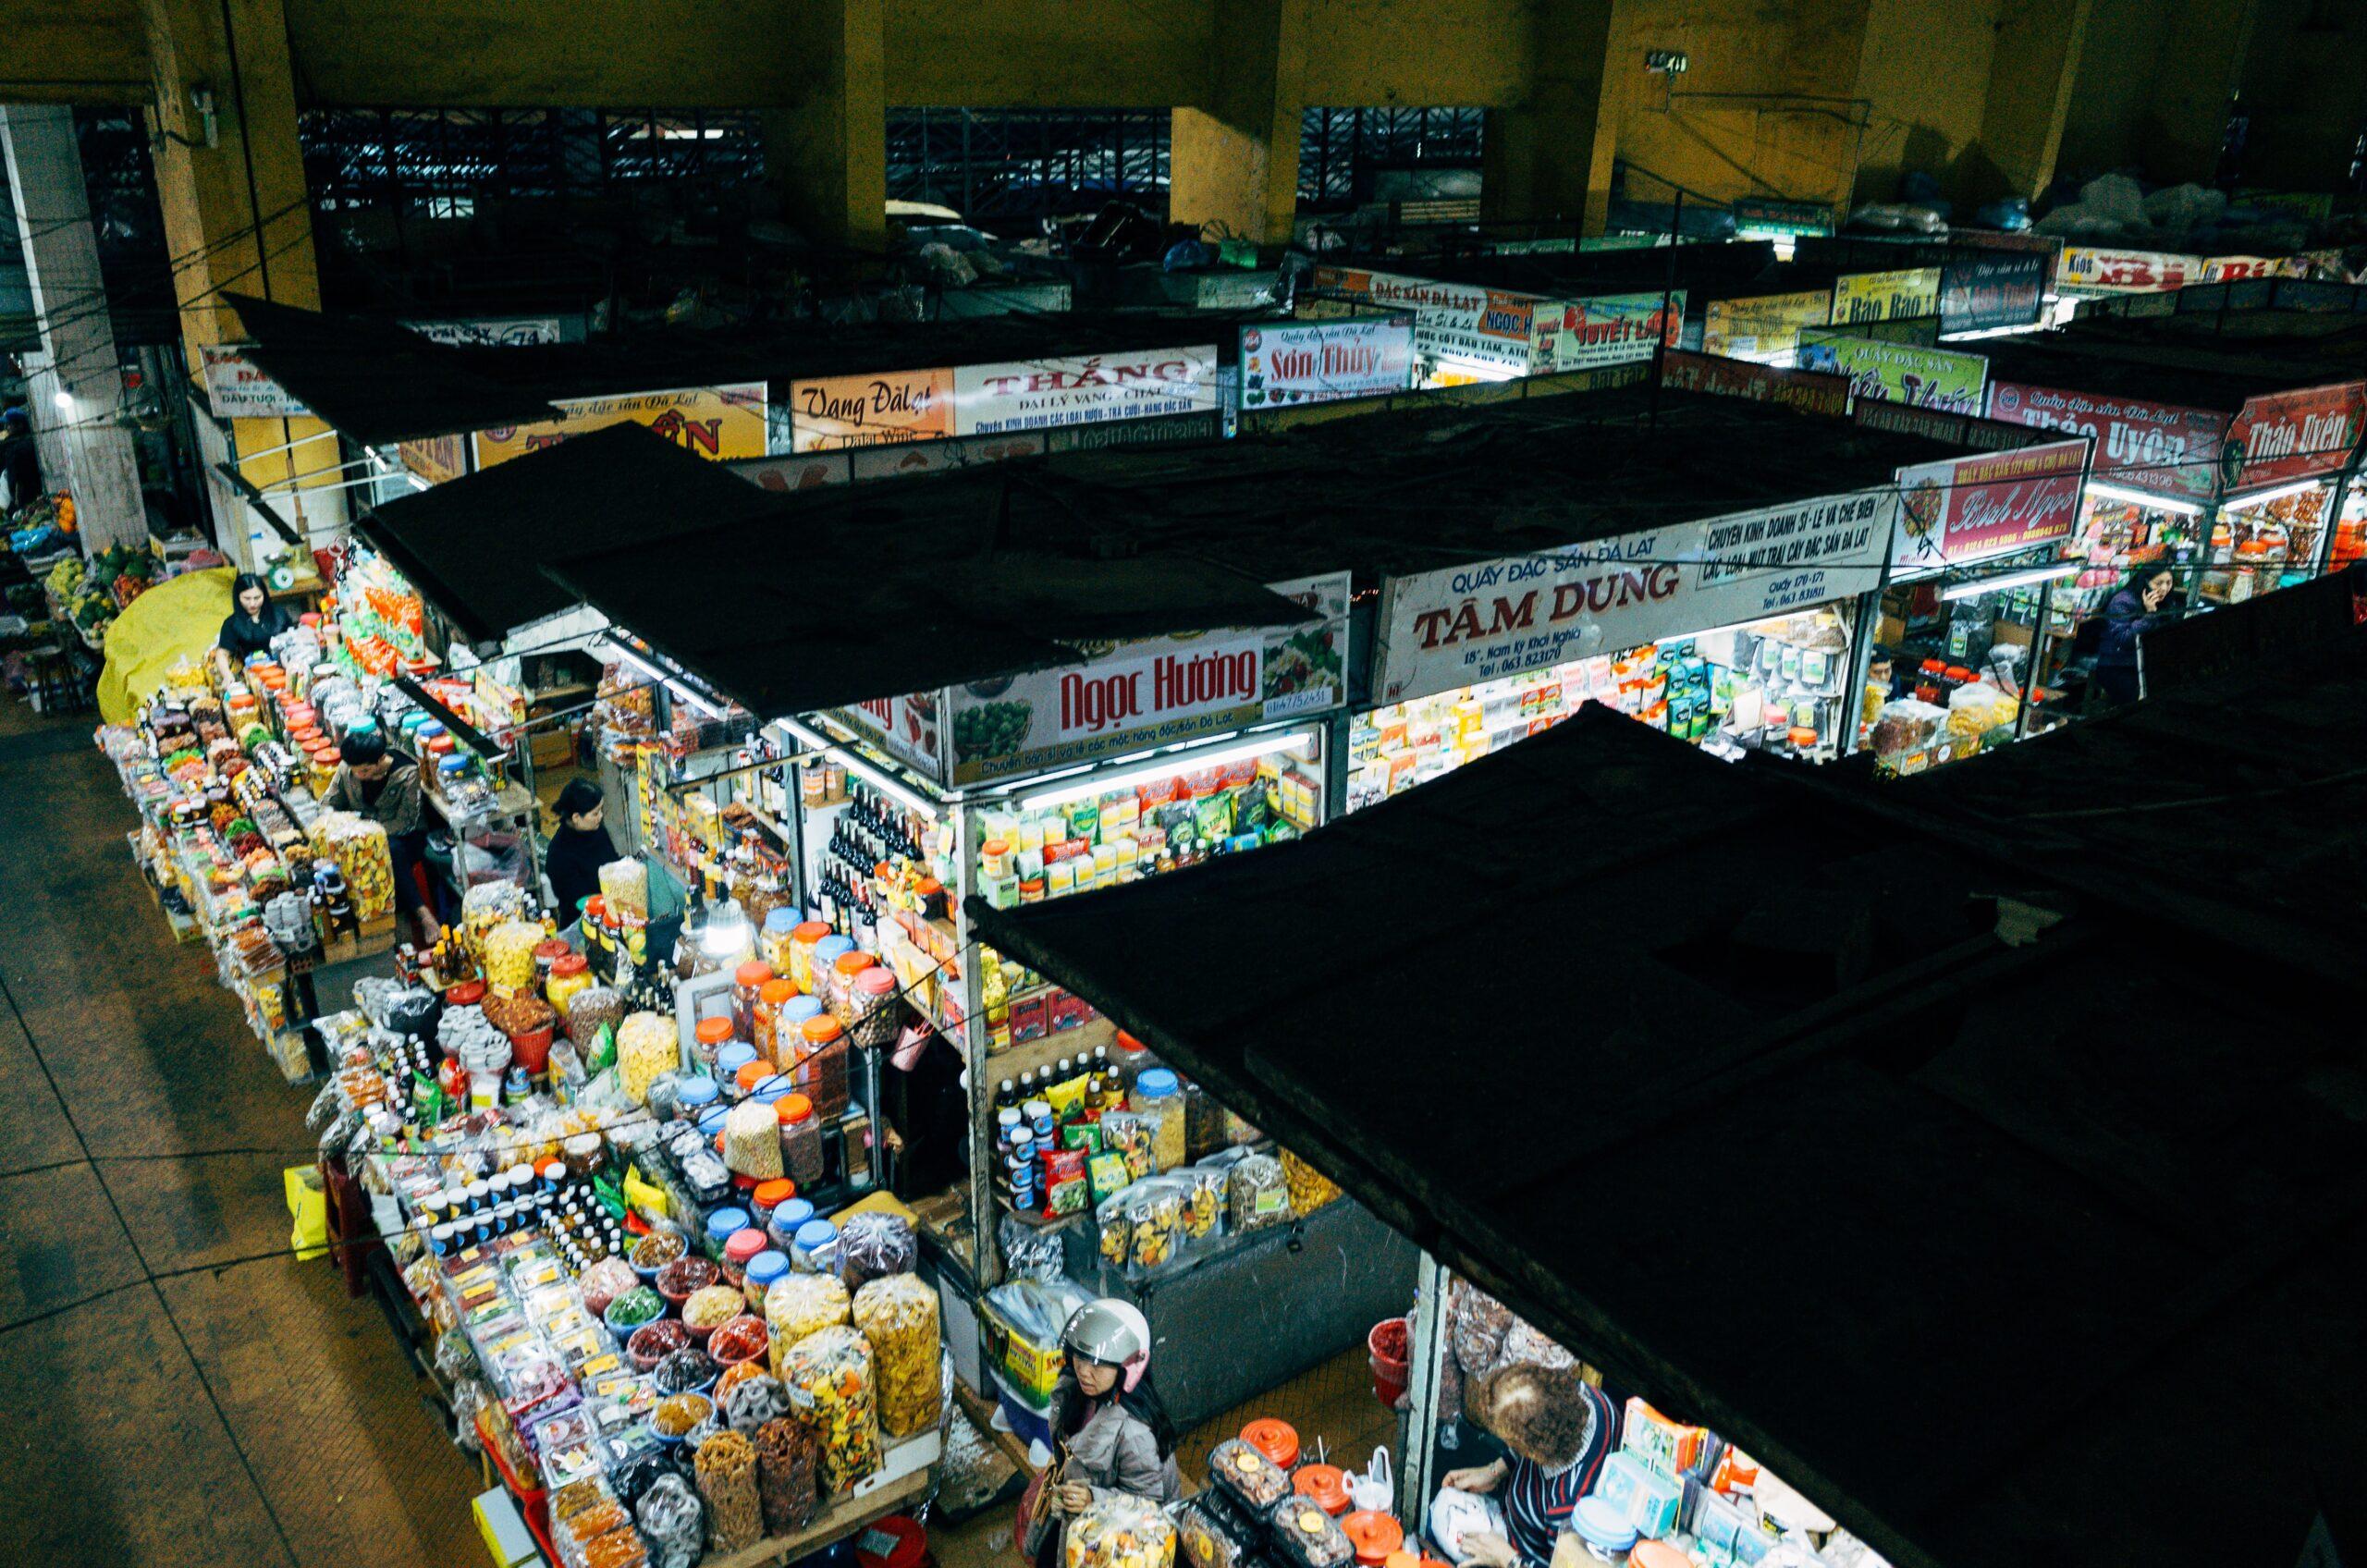 markus-winkler-59ZAMYVpC7s-unsplash